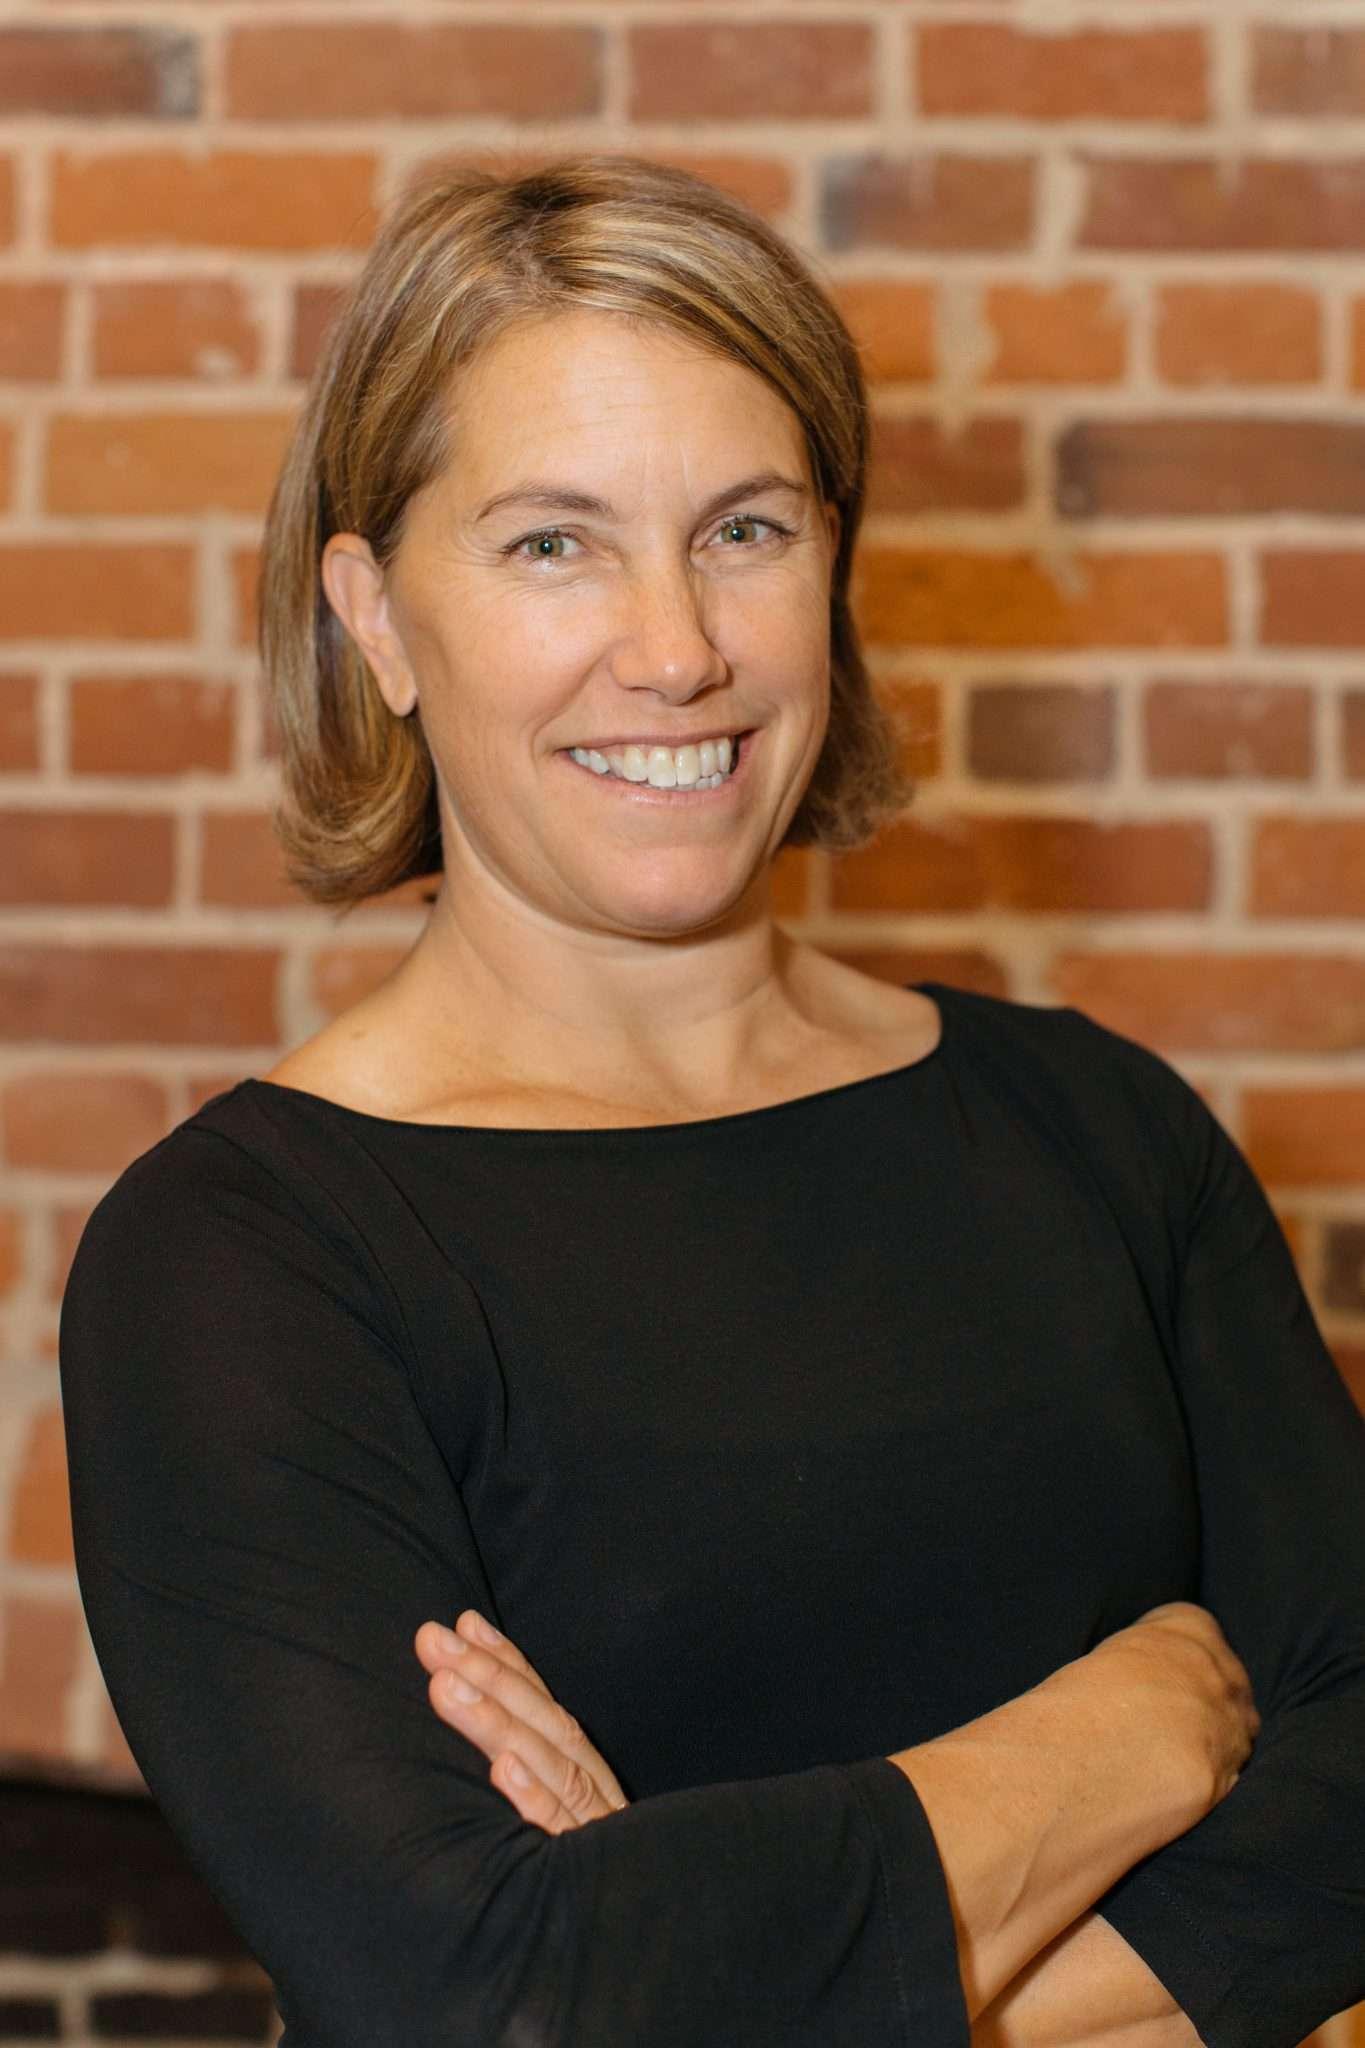 Dr. Laura Gifford